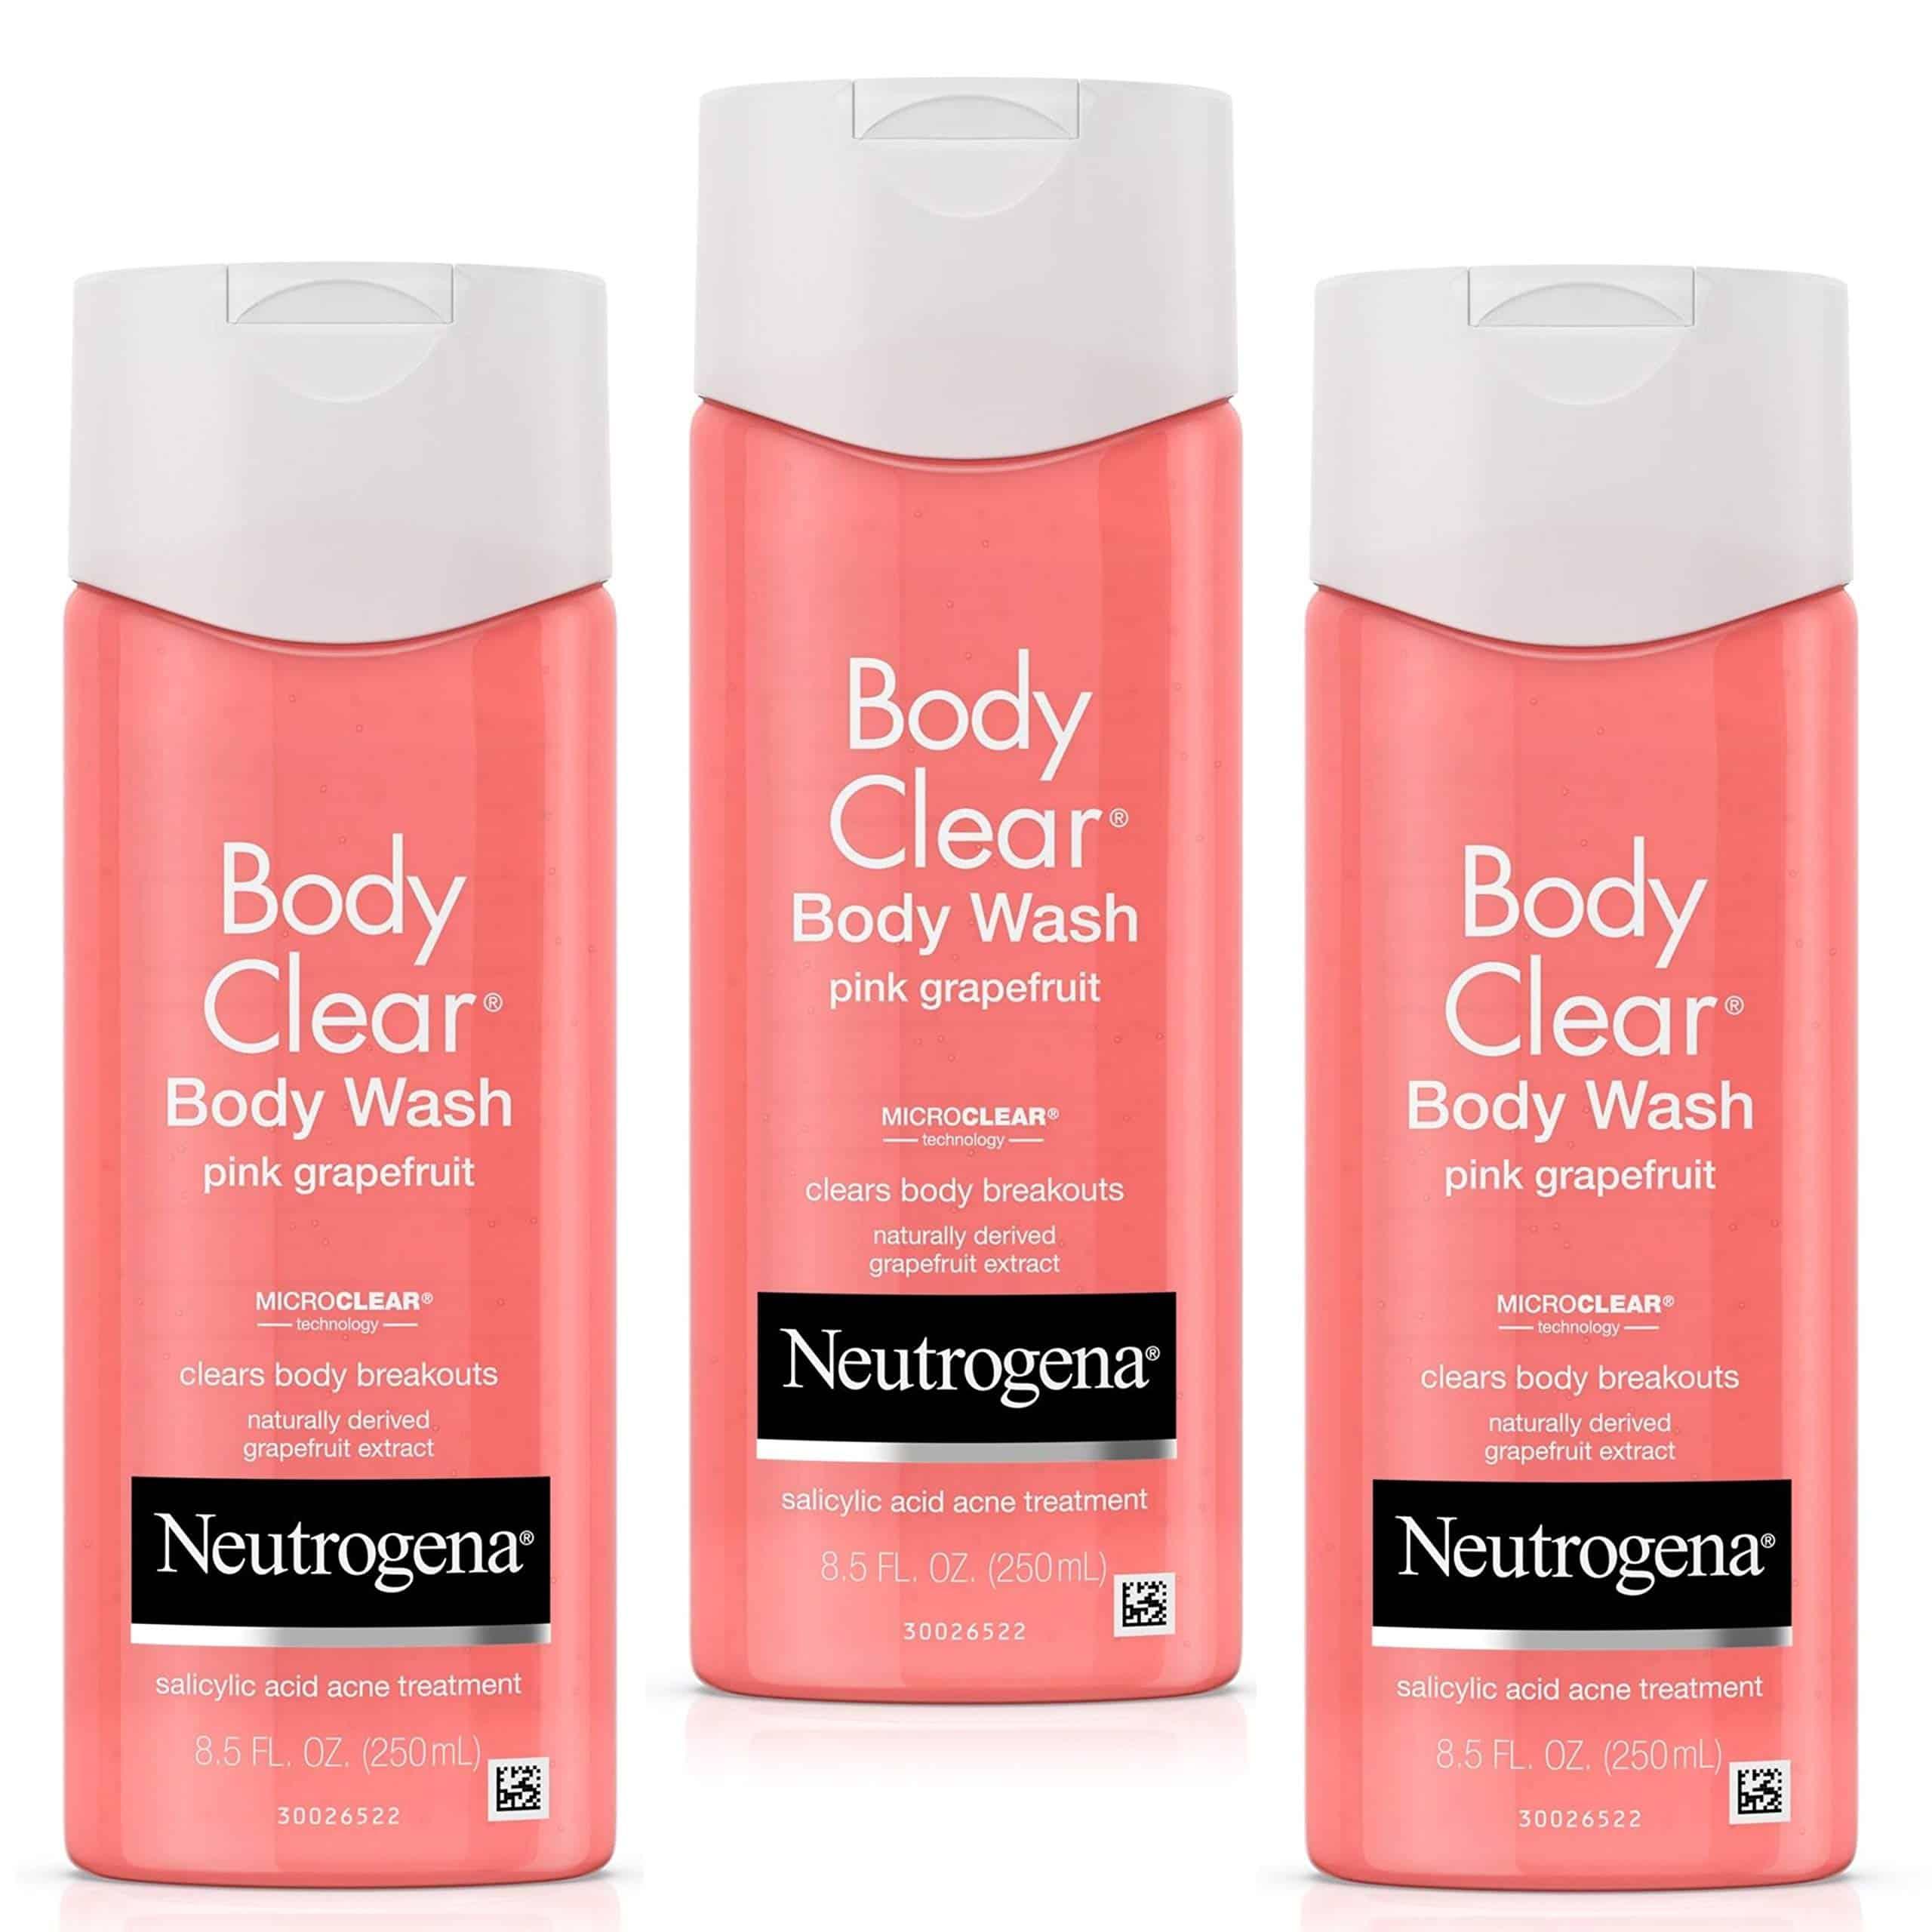 Mua Neutrogena Body Clear Acne Treatment Body Wash with 2% Salicylic Acid  Acne Medicine to Prevent Body Breakouts, Pink Grapefruit Shower Gel for  Back, Chest & Shoulders, Vitamin C, 8.5 fl. oz (